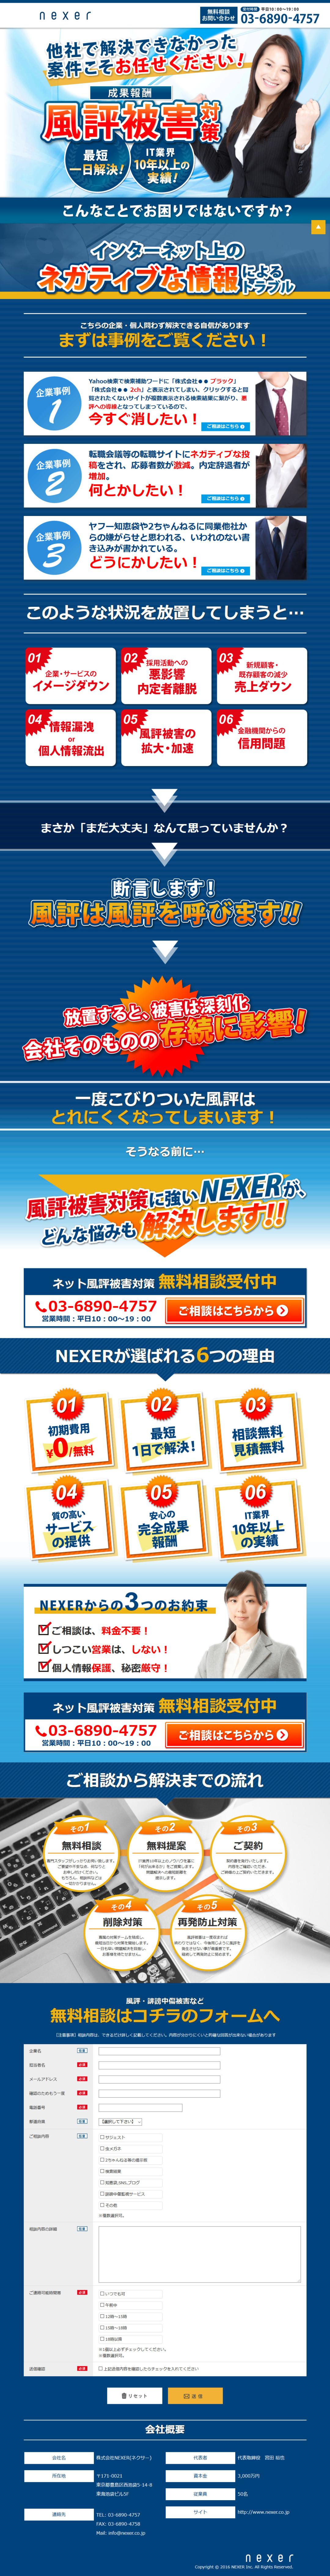 nexerの風評被害対策